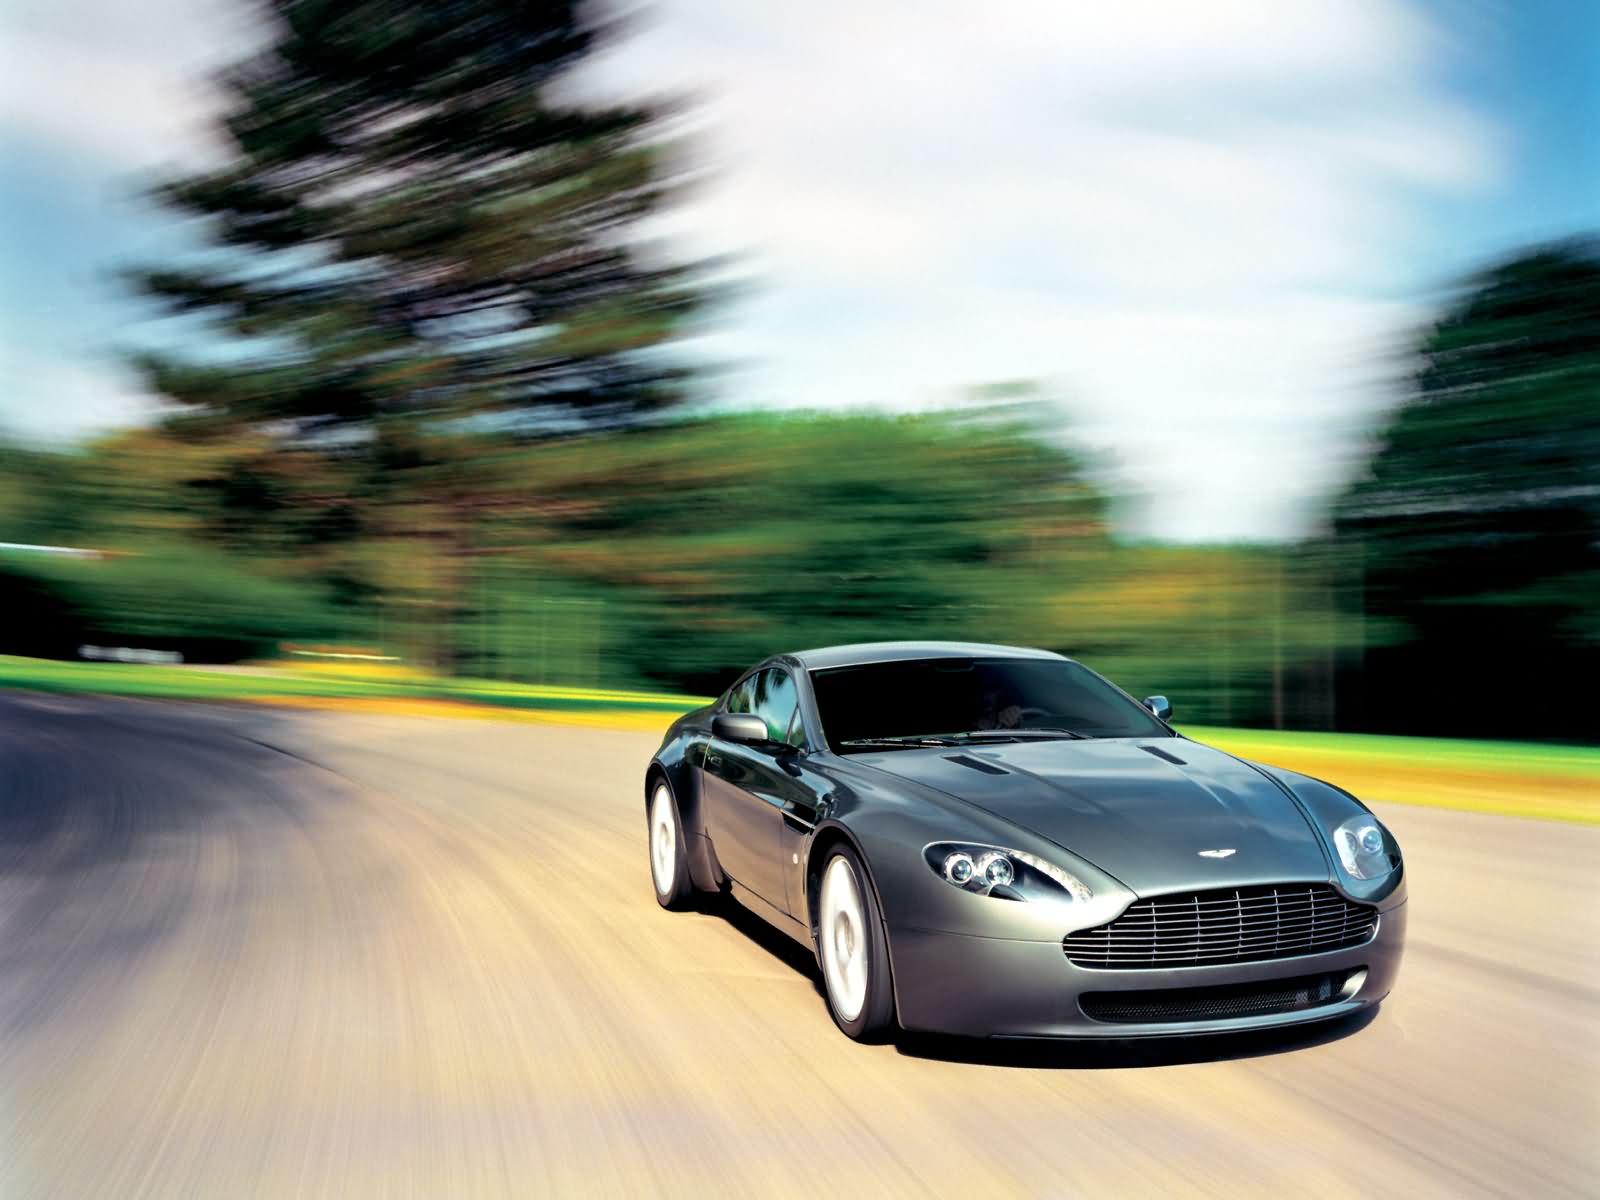 Aston Martin Vantage Wallpapers Top Free Aston Martin Vantage Backgrounds Wallpaperaccess